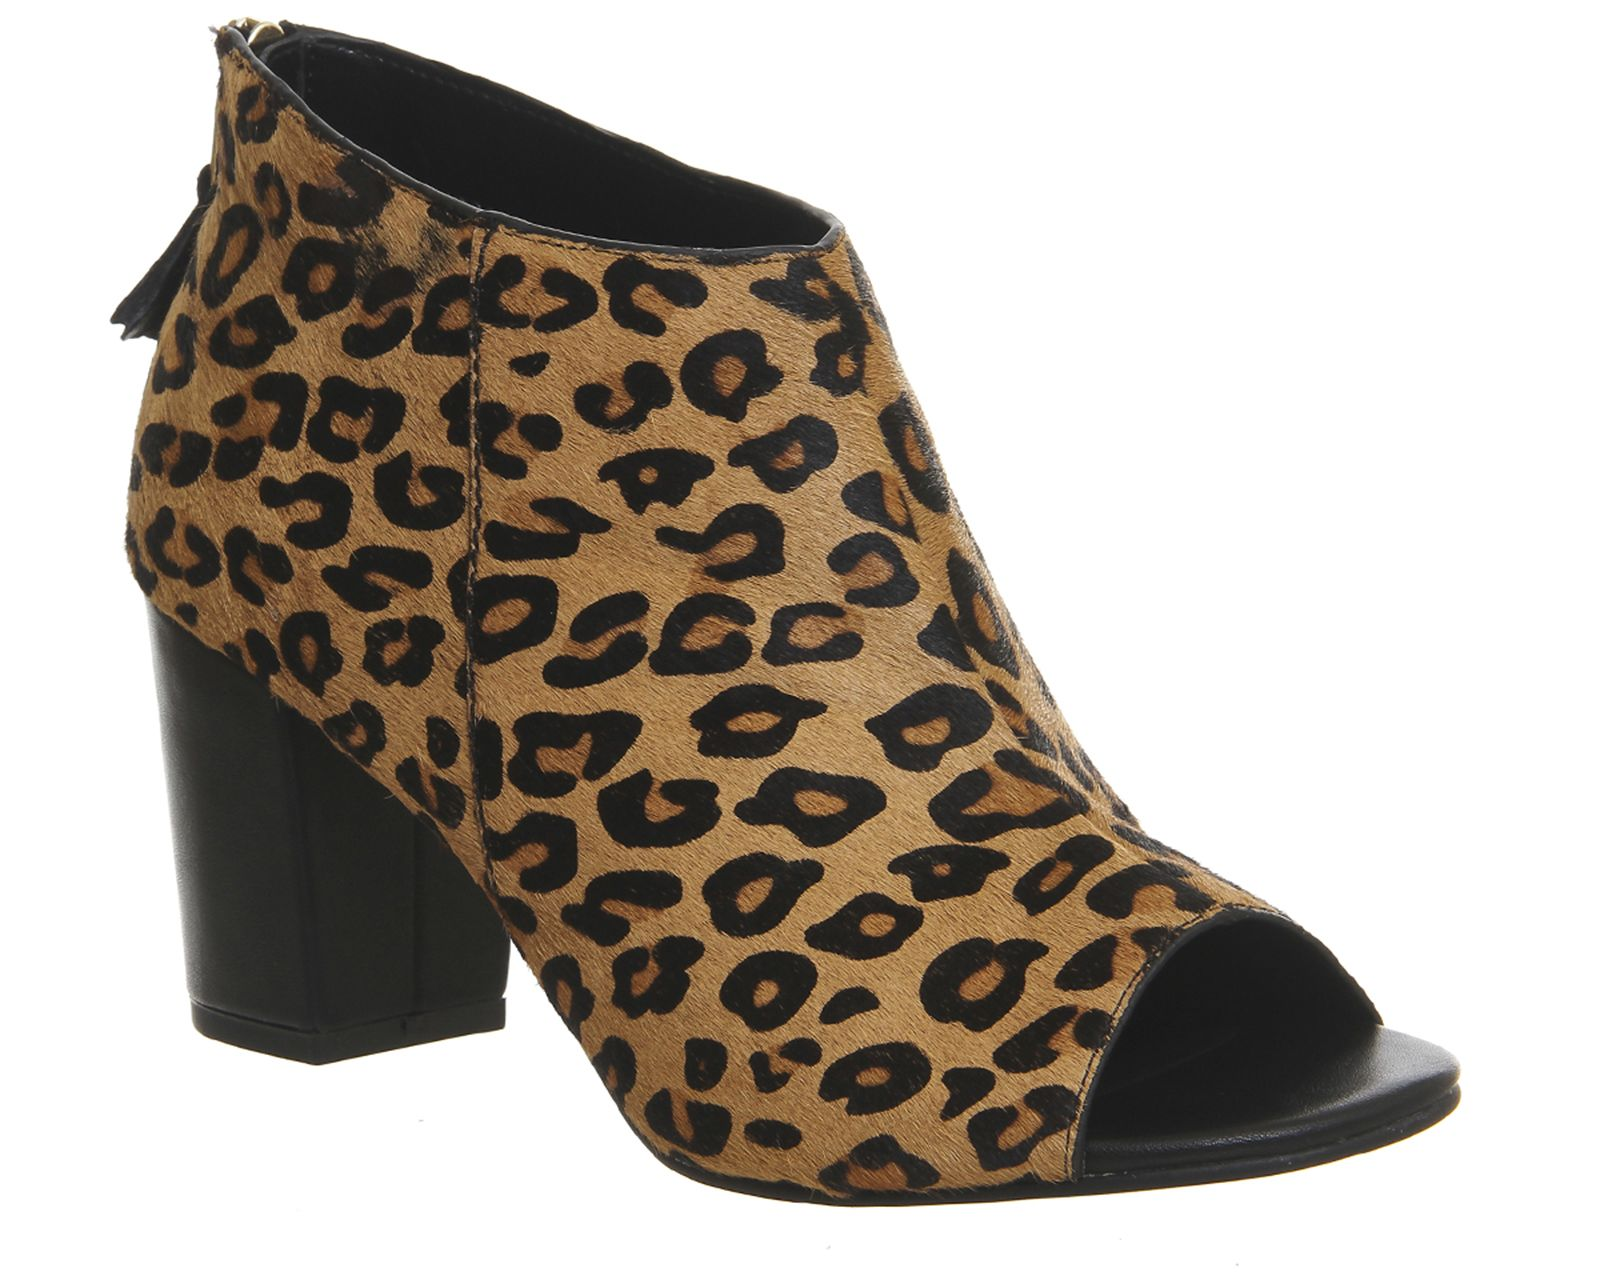 Office Quarter Back Zip Peep Toe Womens Mid Heels Leopard Pony Hair Effect